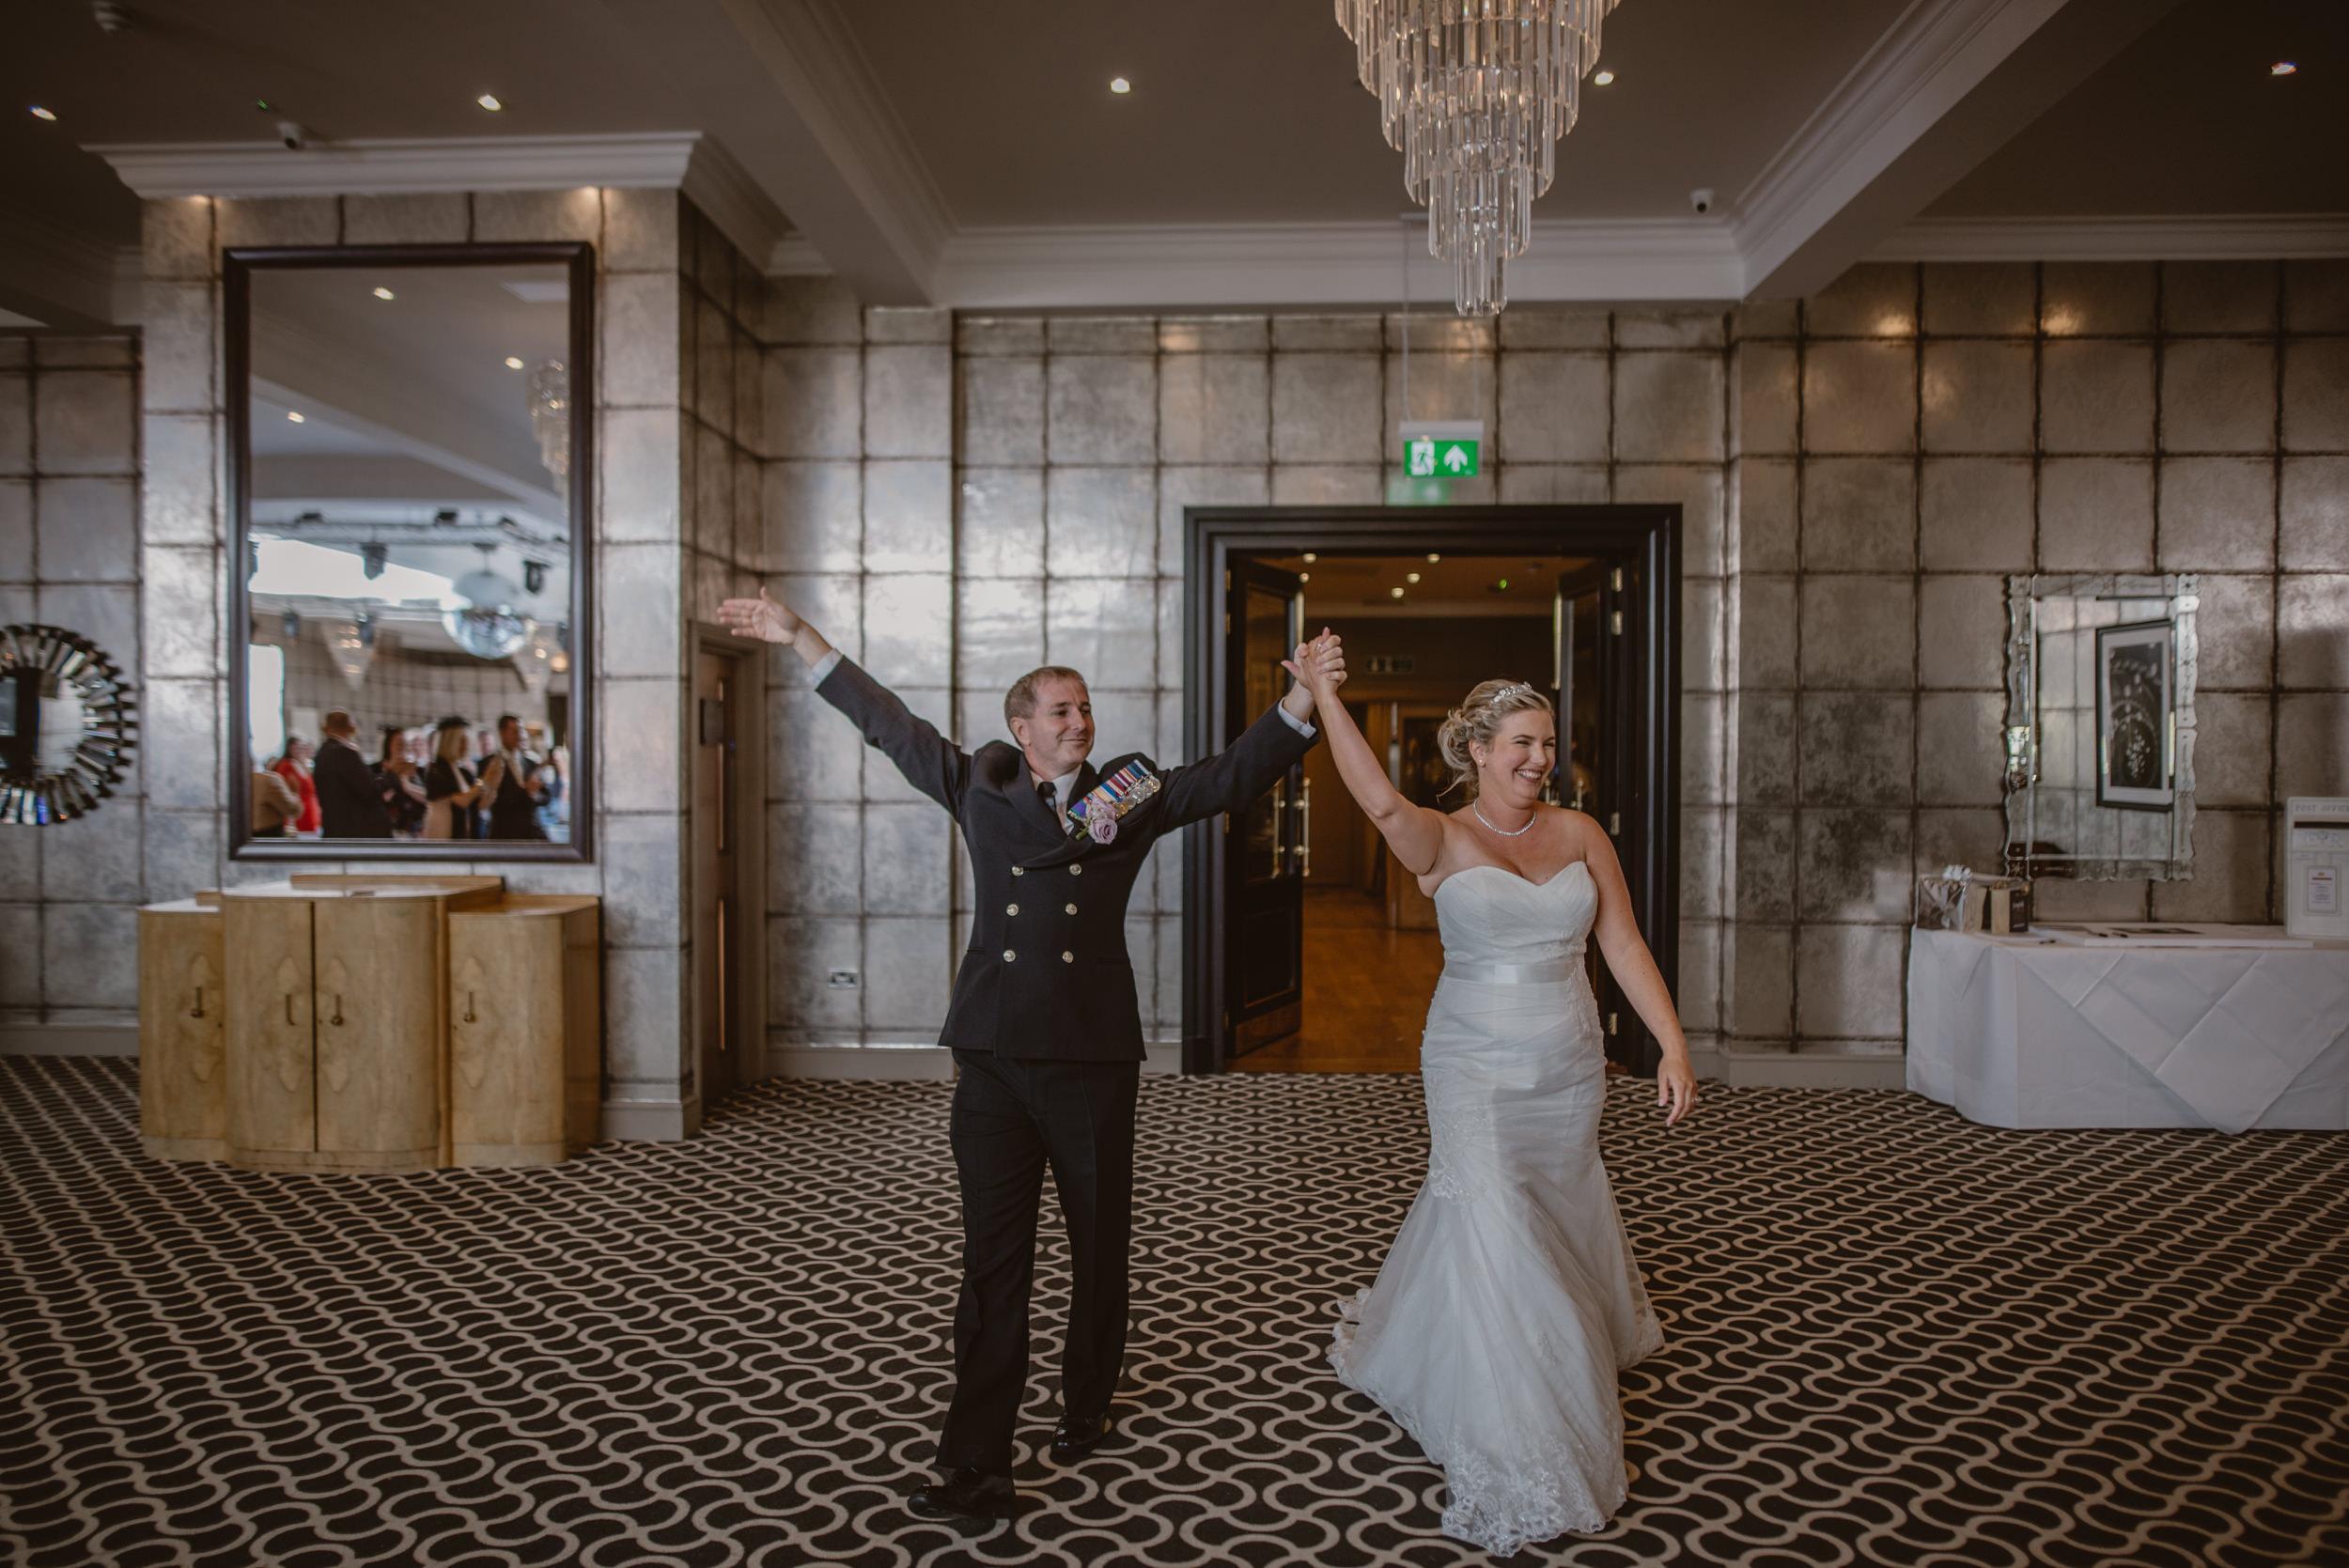 Chantelle-and-Stephen-Old-Thorns-Hotel-Wedding-Liphook-Manu-Mendoza-Wedding-Photography-340.jpg